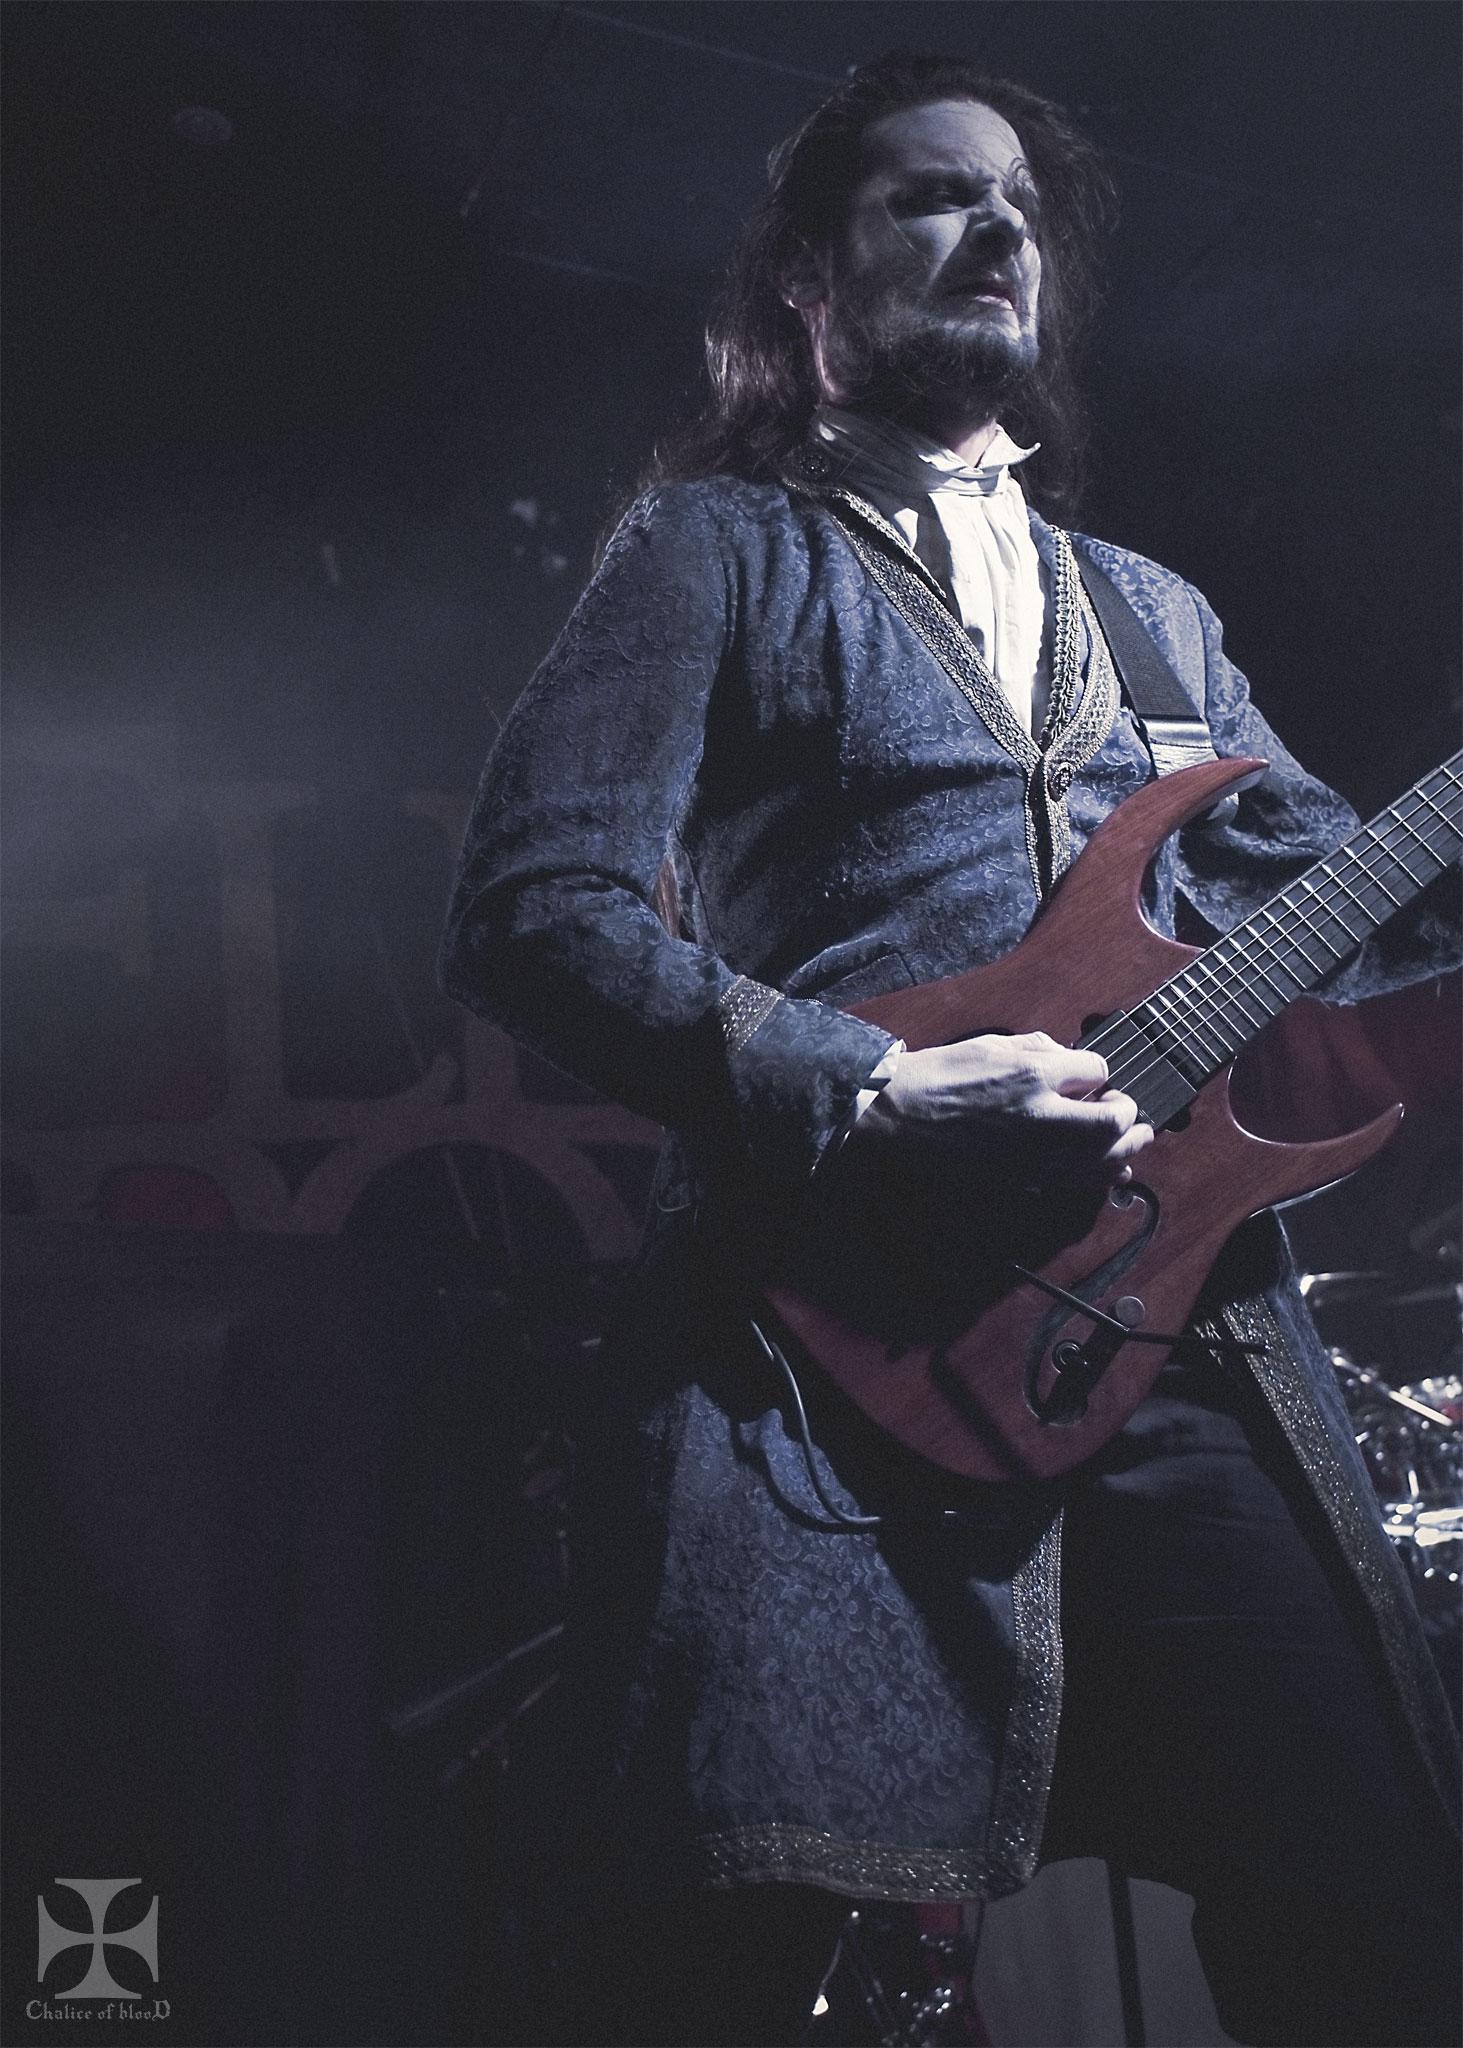 Fleshgod-Apocalypse-0032-Exposure-watermarked.jpg